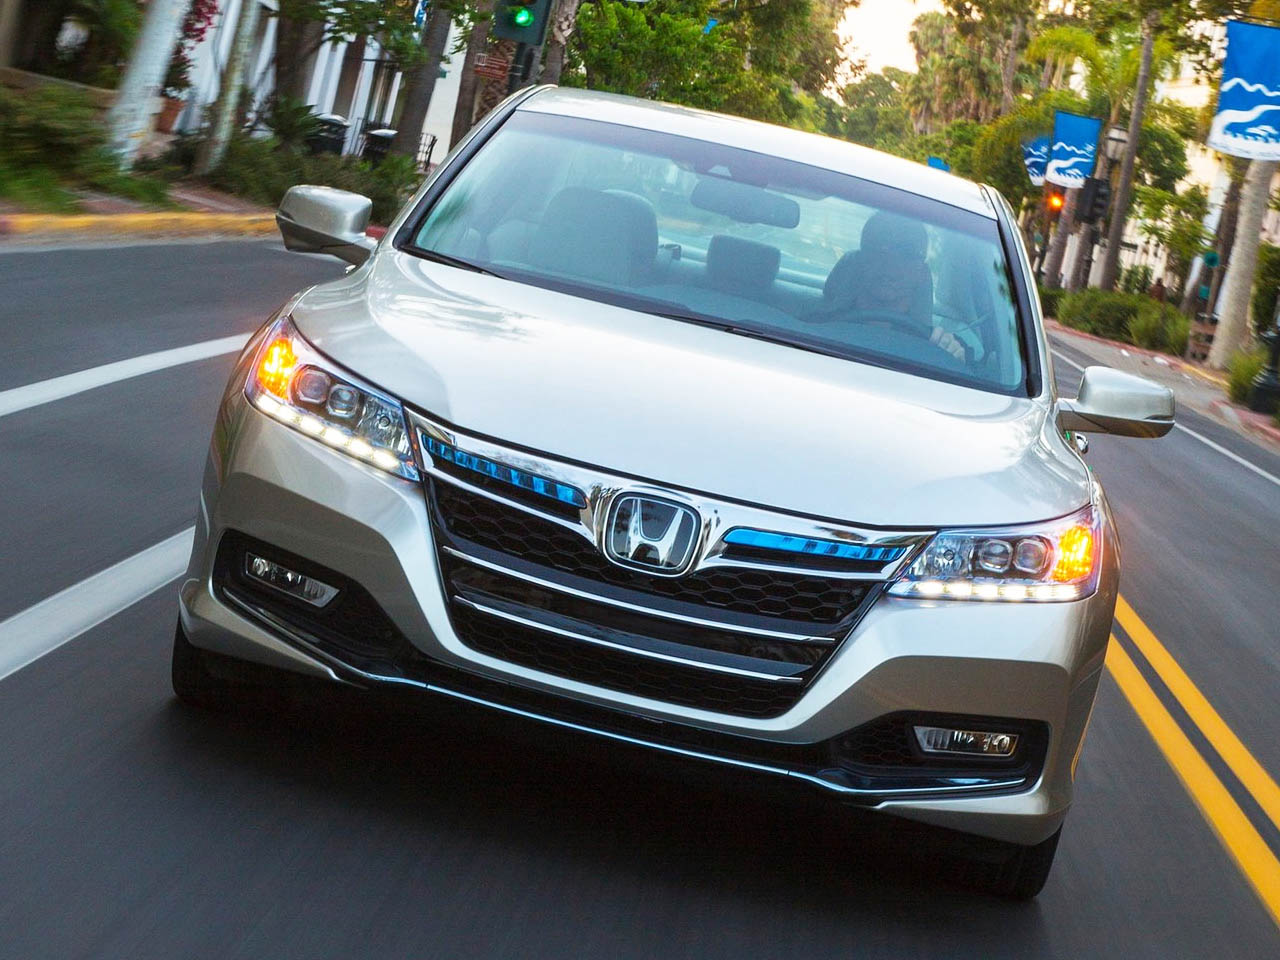 2014 Honda Accord Hybrid Technology Version